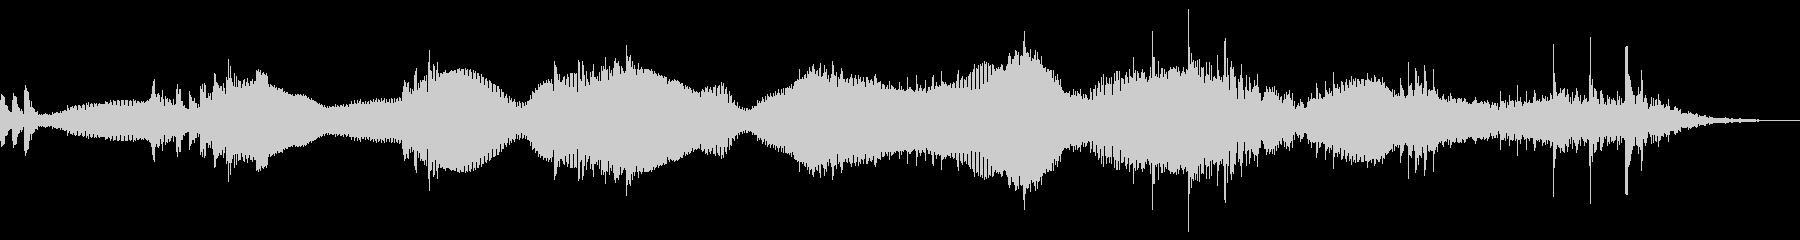 SUSPENSE 3オーケストラヒ...の未再生の波形